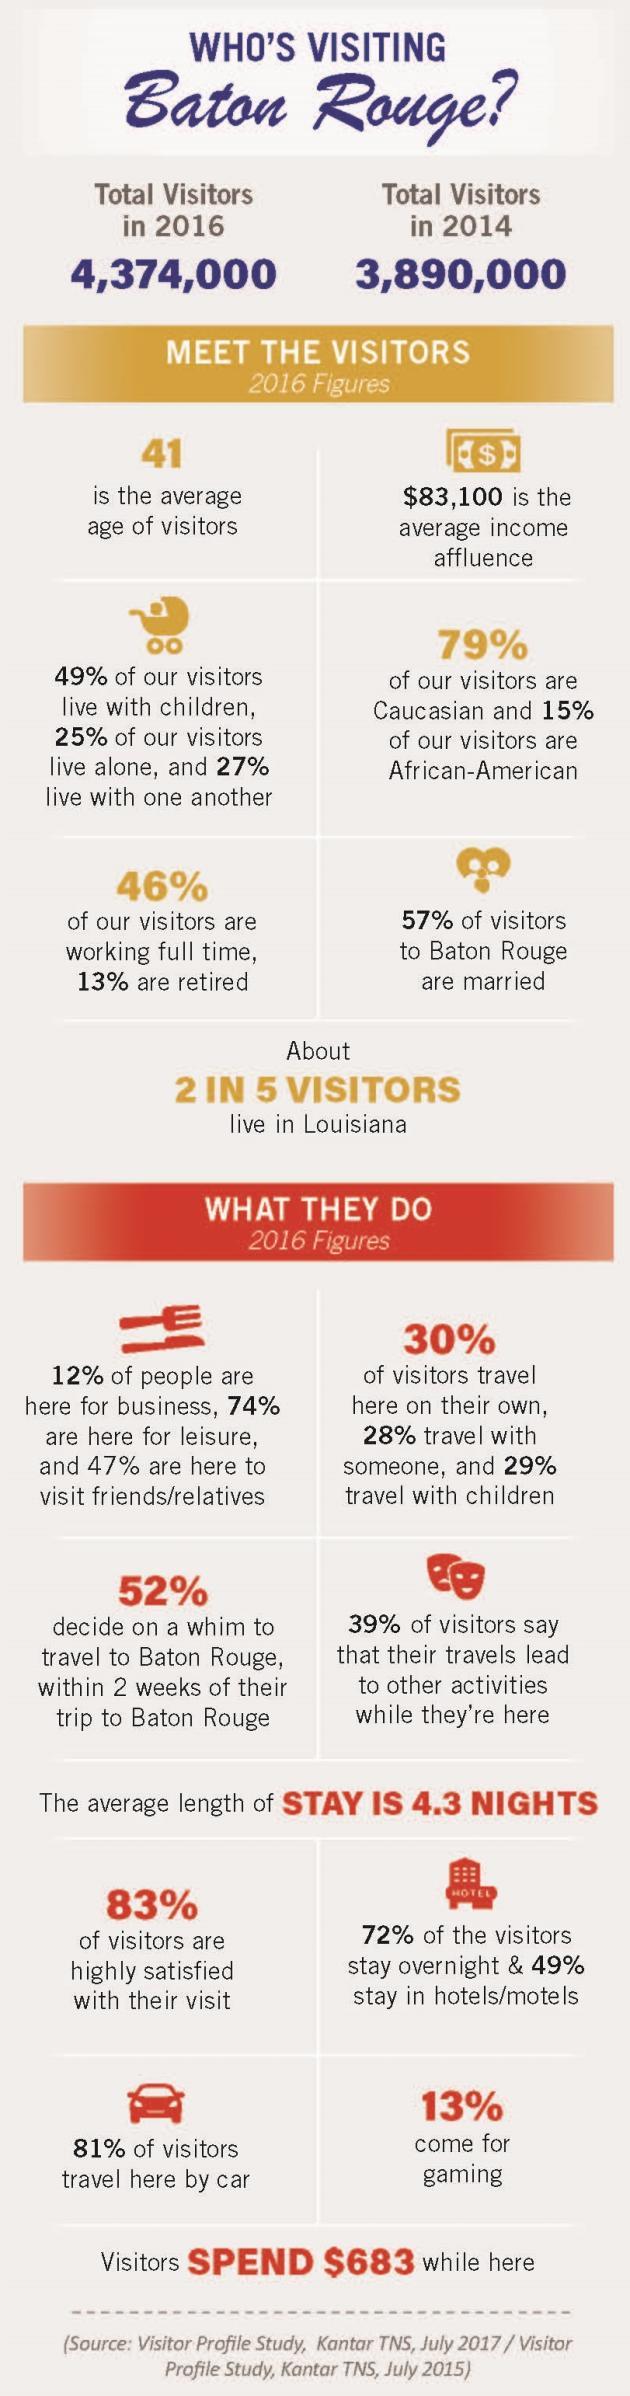 Business Report VBR Industry Insight